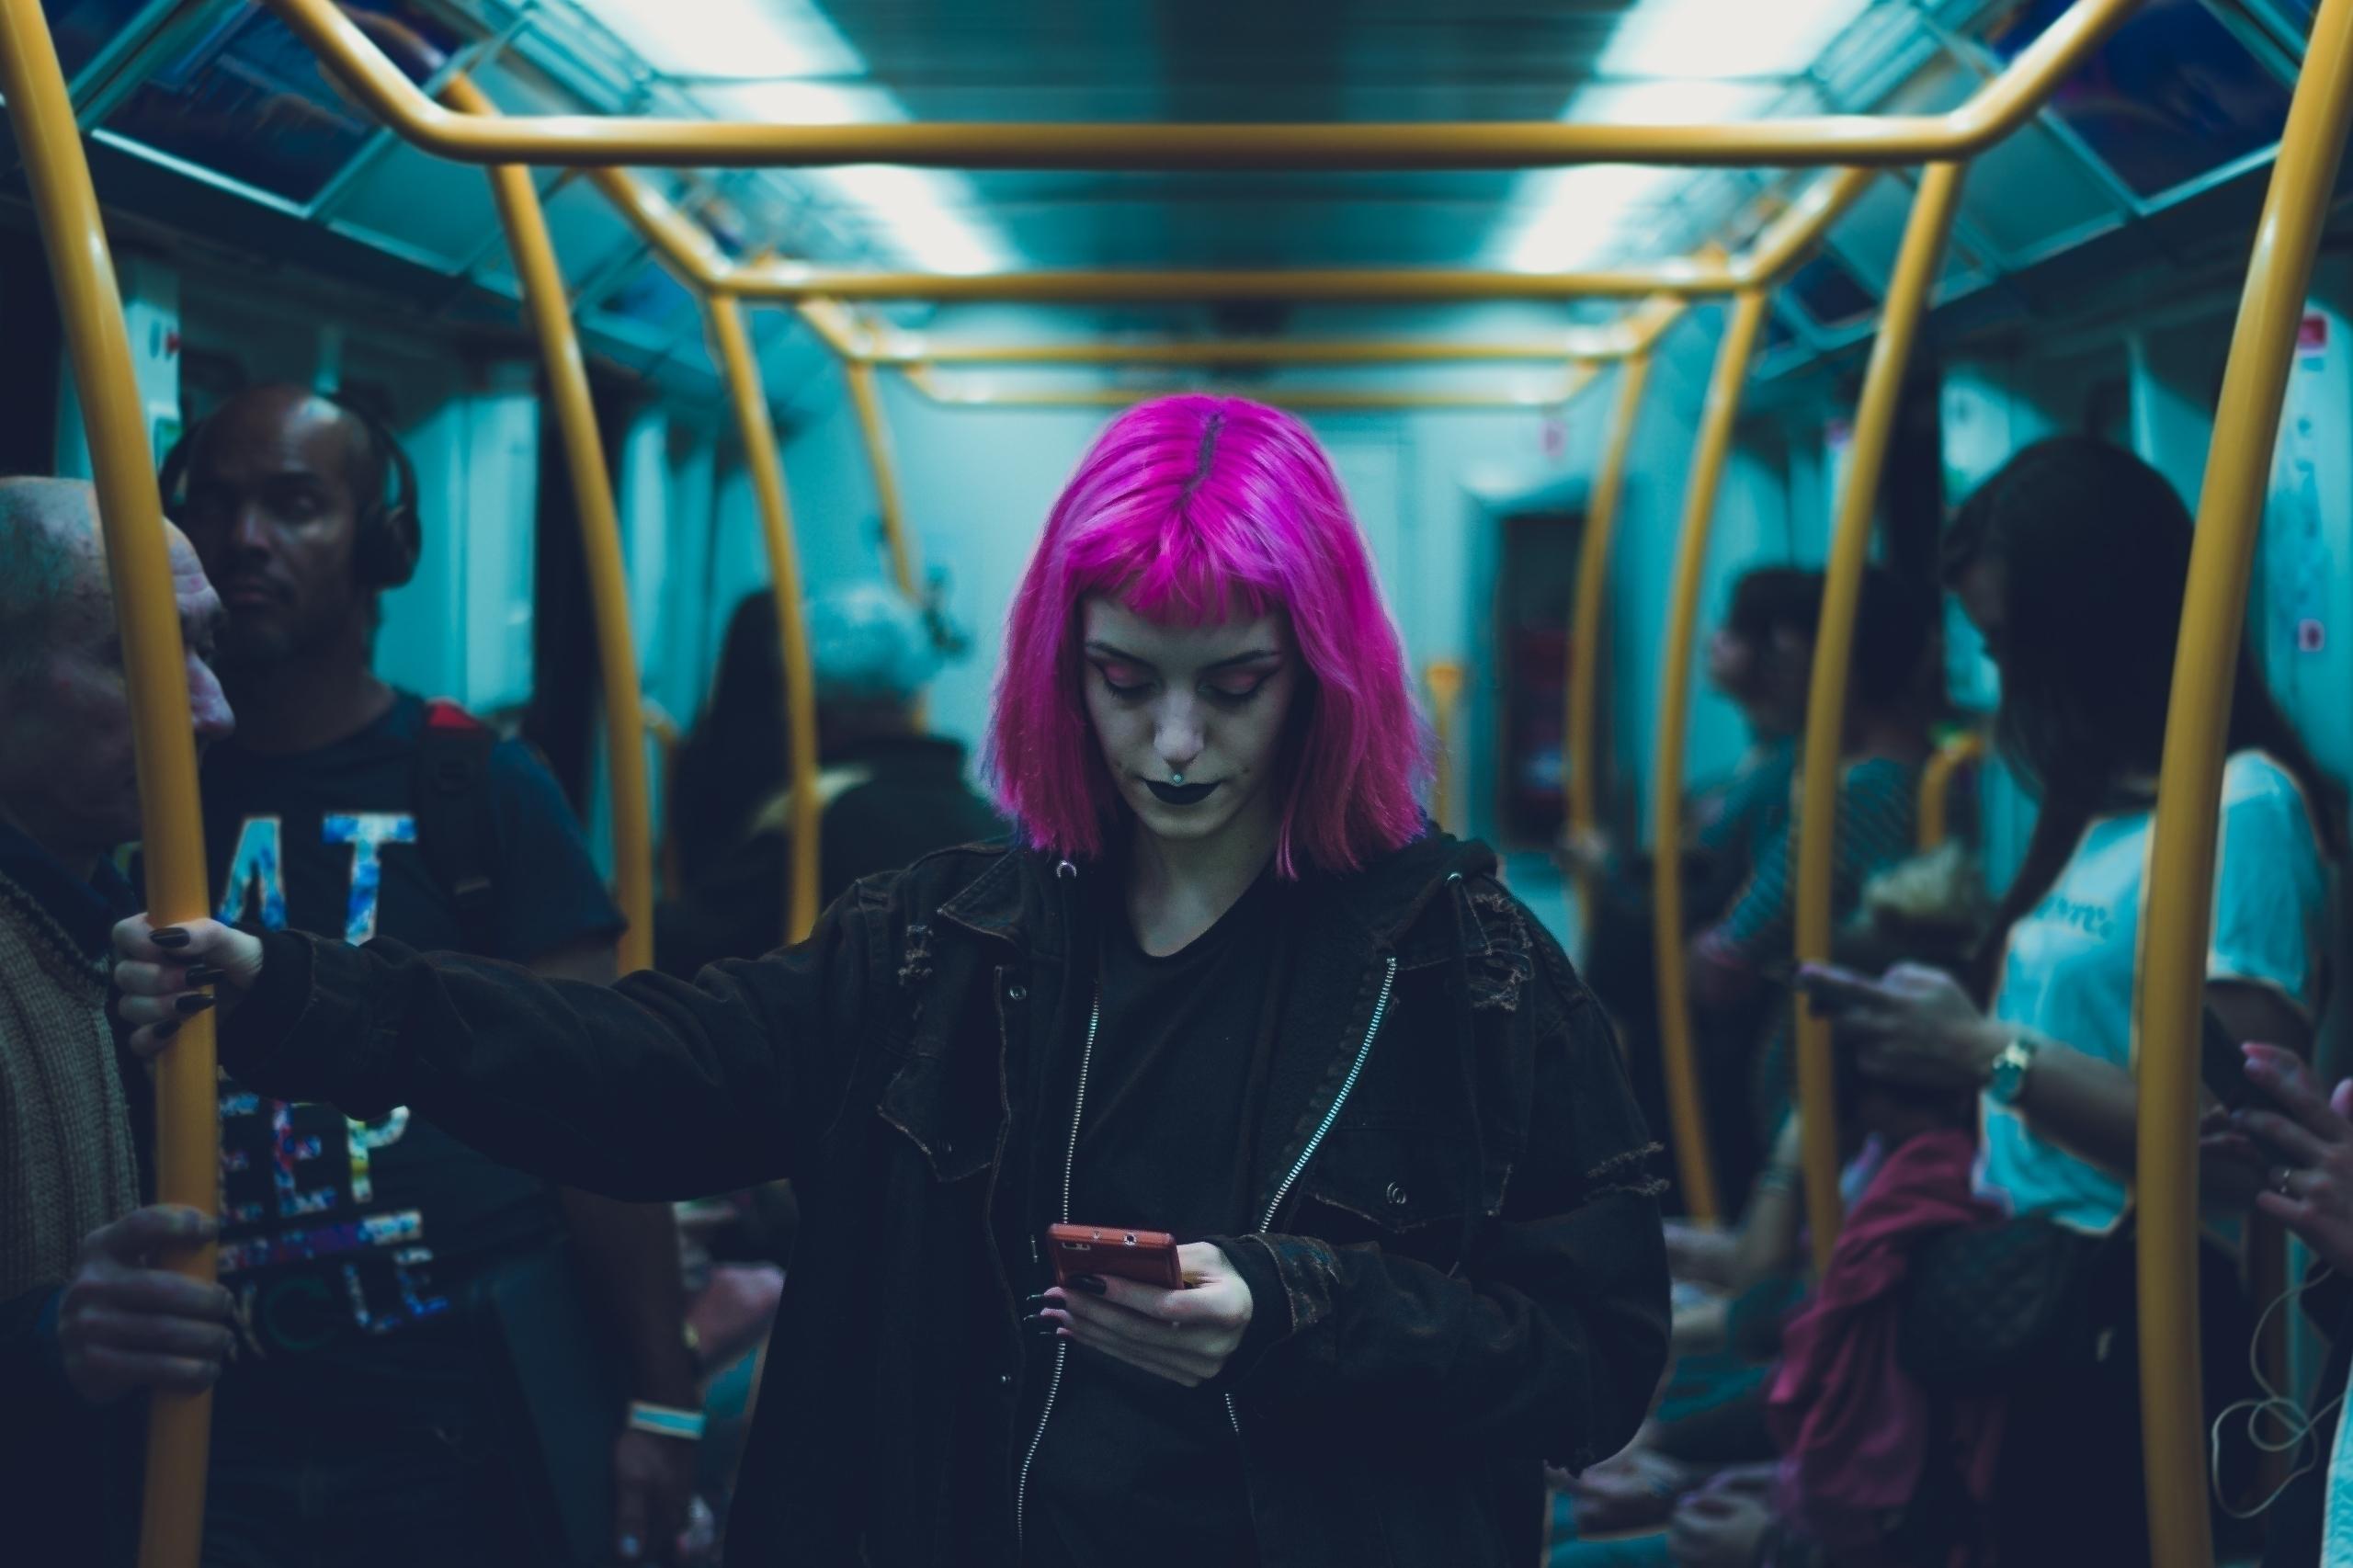 subway situation - photography, portrait - darumatuertophoto | ello